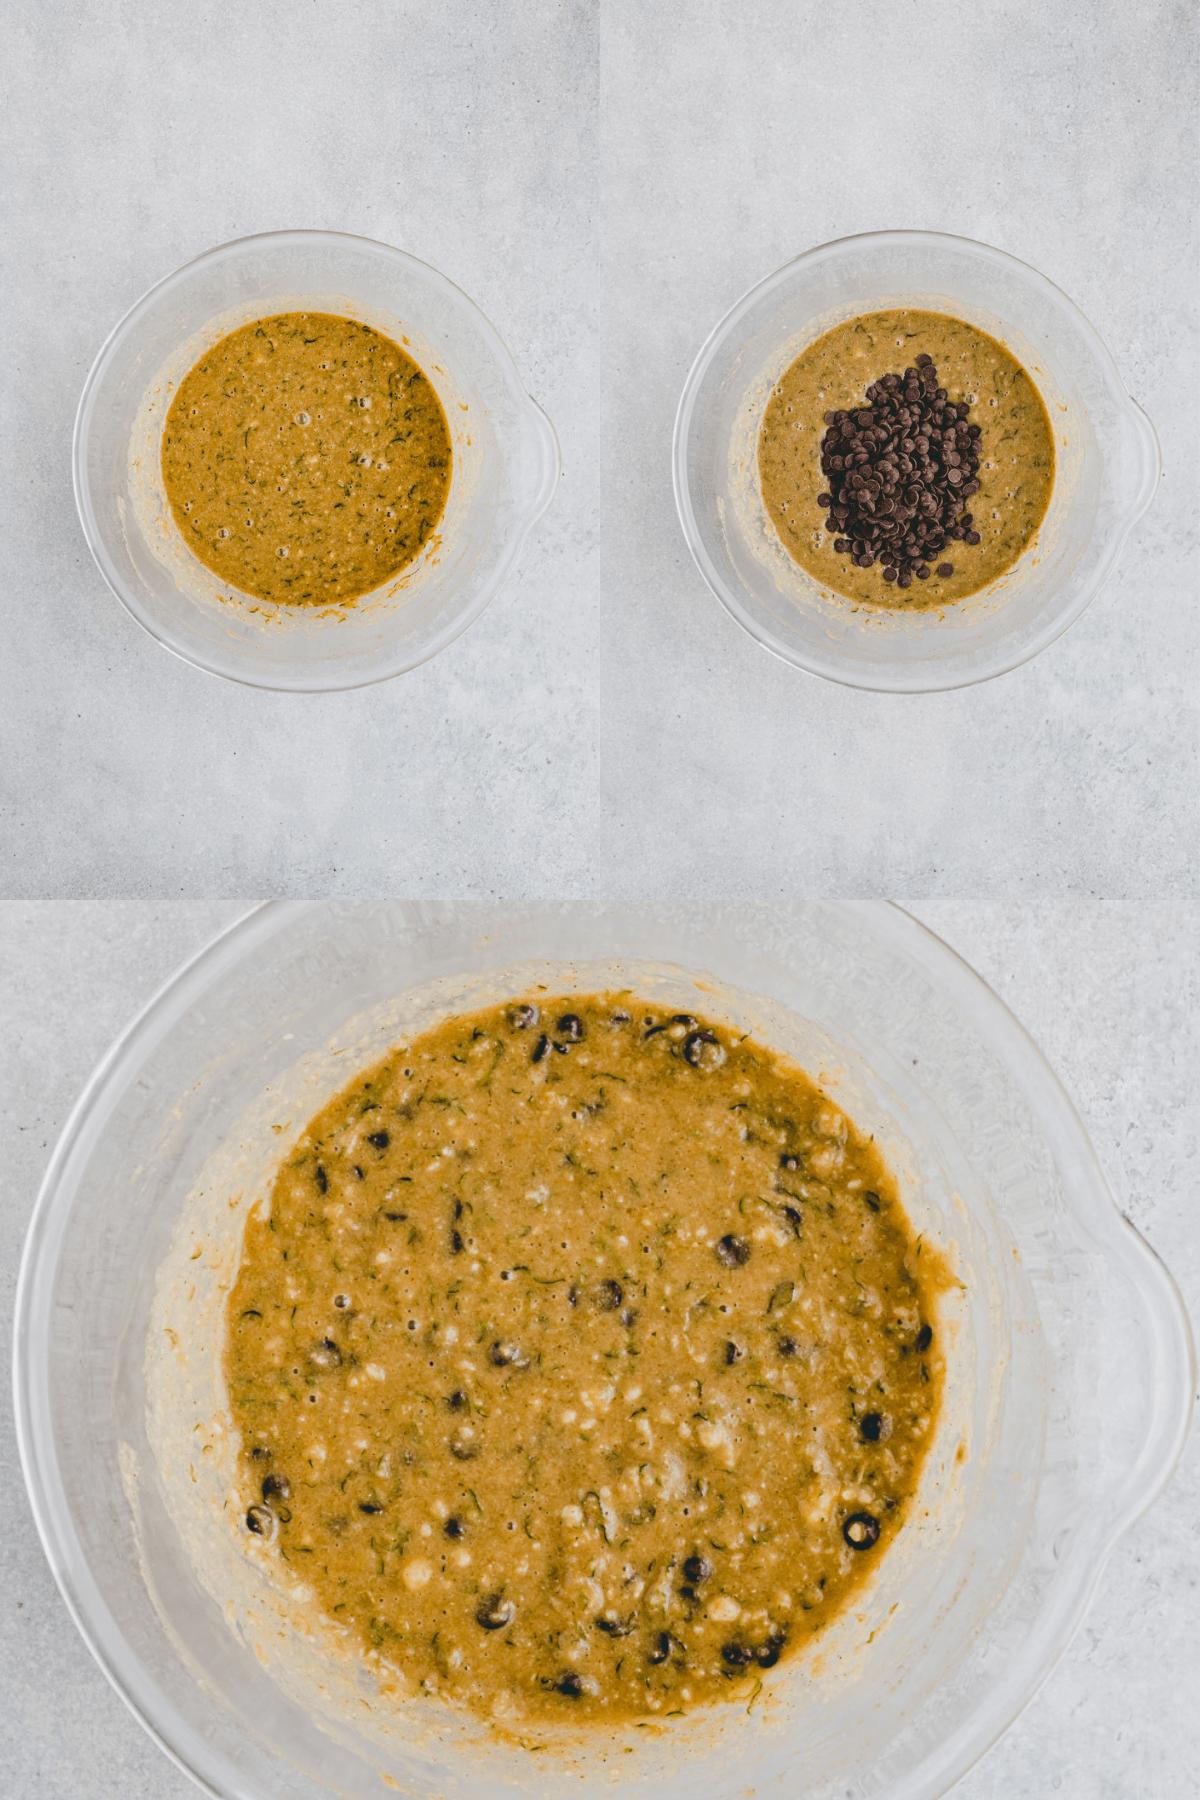 Glutenfreier Zucchinikuchen Rezept Schritt 9-11